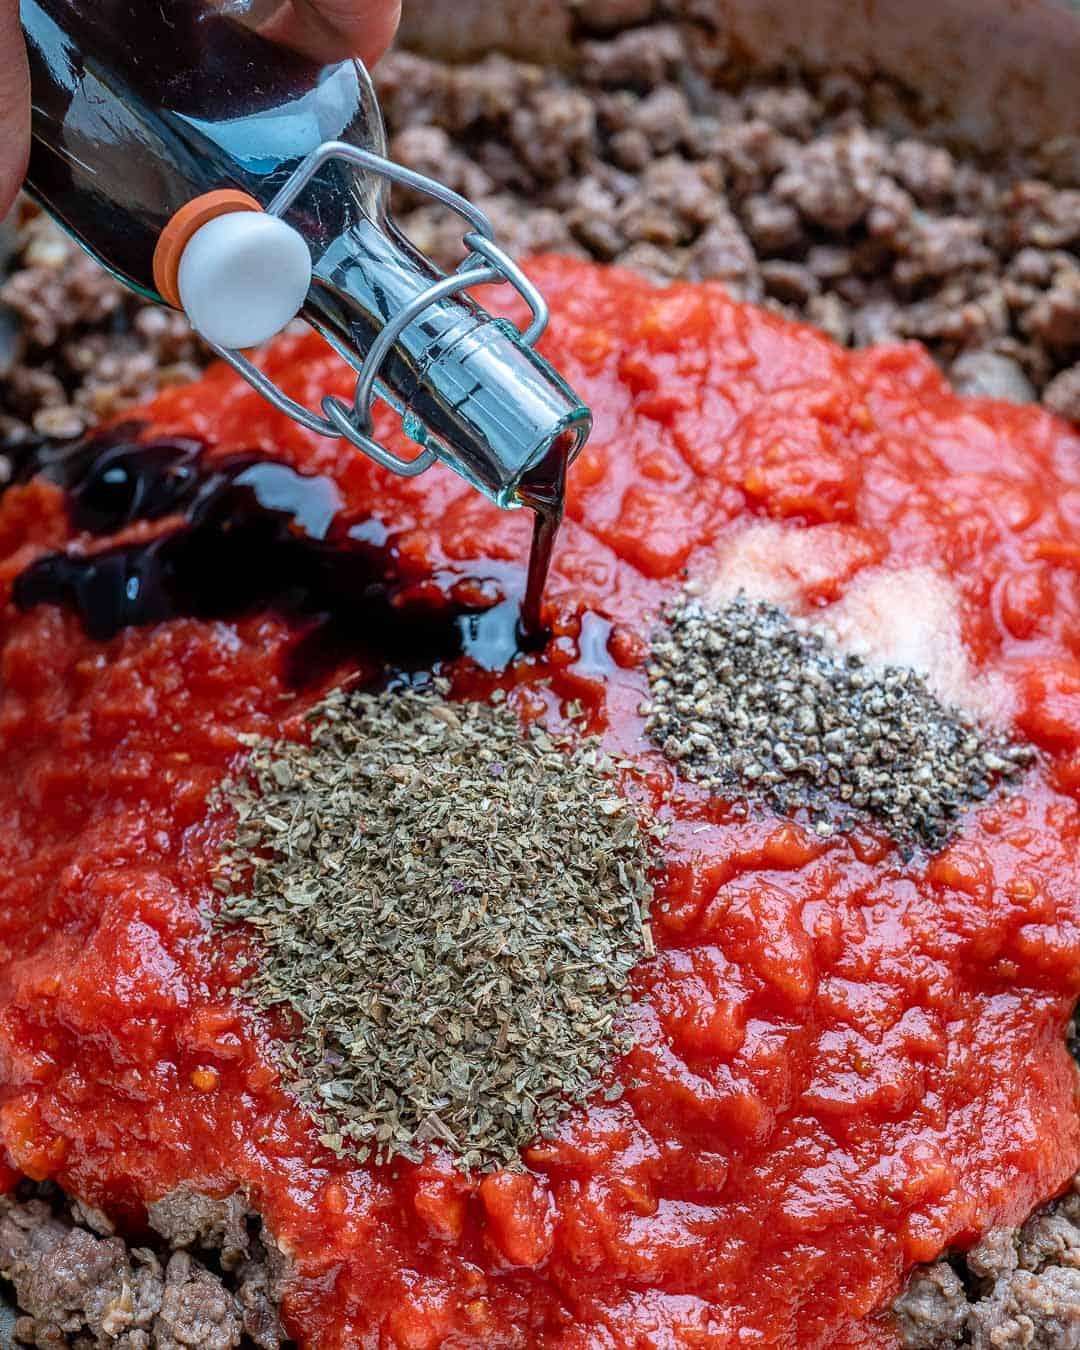 Add the tomatoes, balsamic vinegar, dried basil, salt, and pepper.